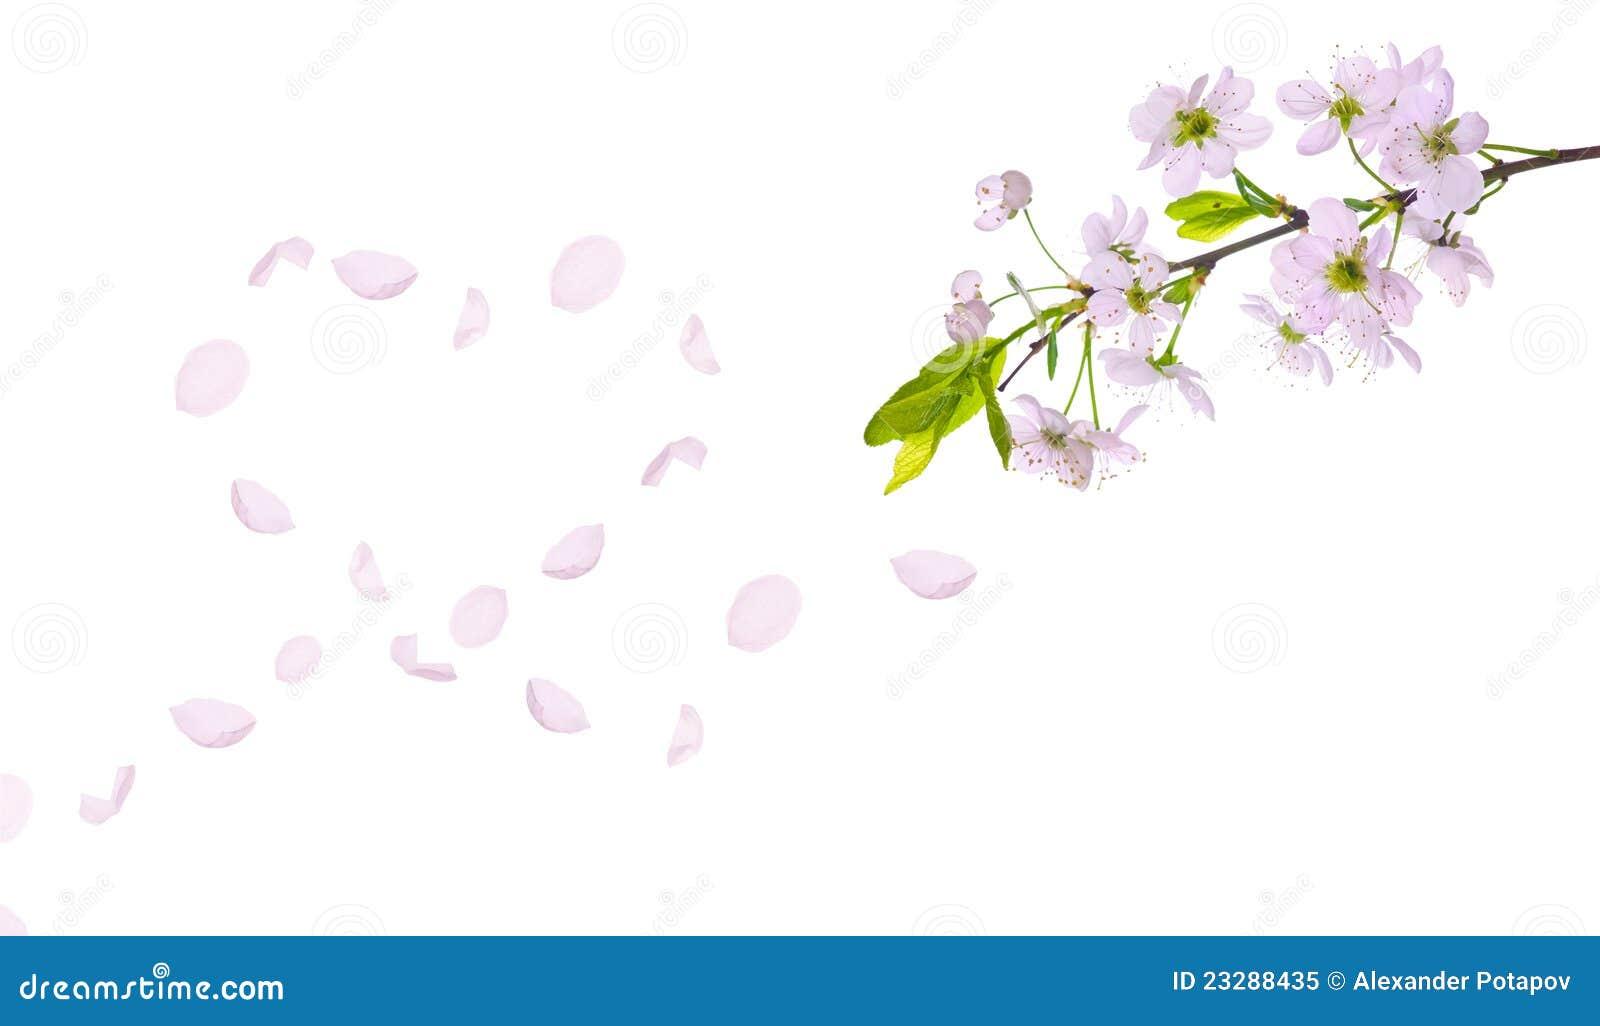 96ddc6259355 Coeur De Pétales De Cerisier De Source Photo libre de